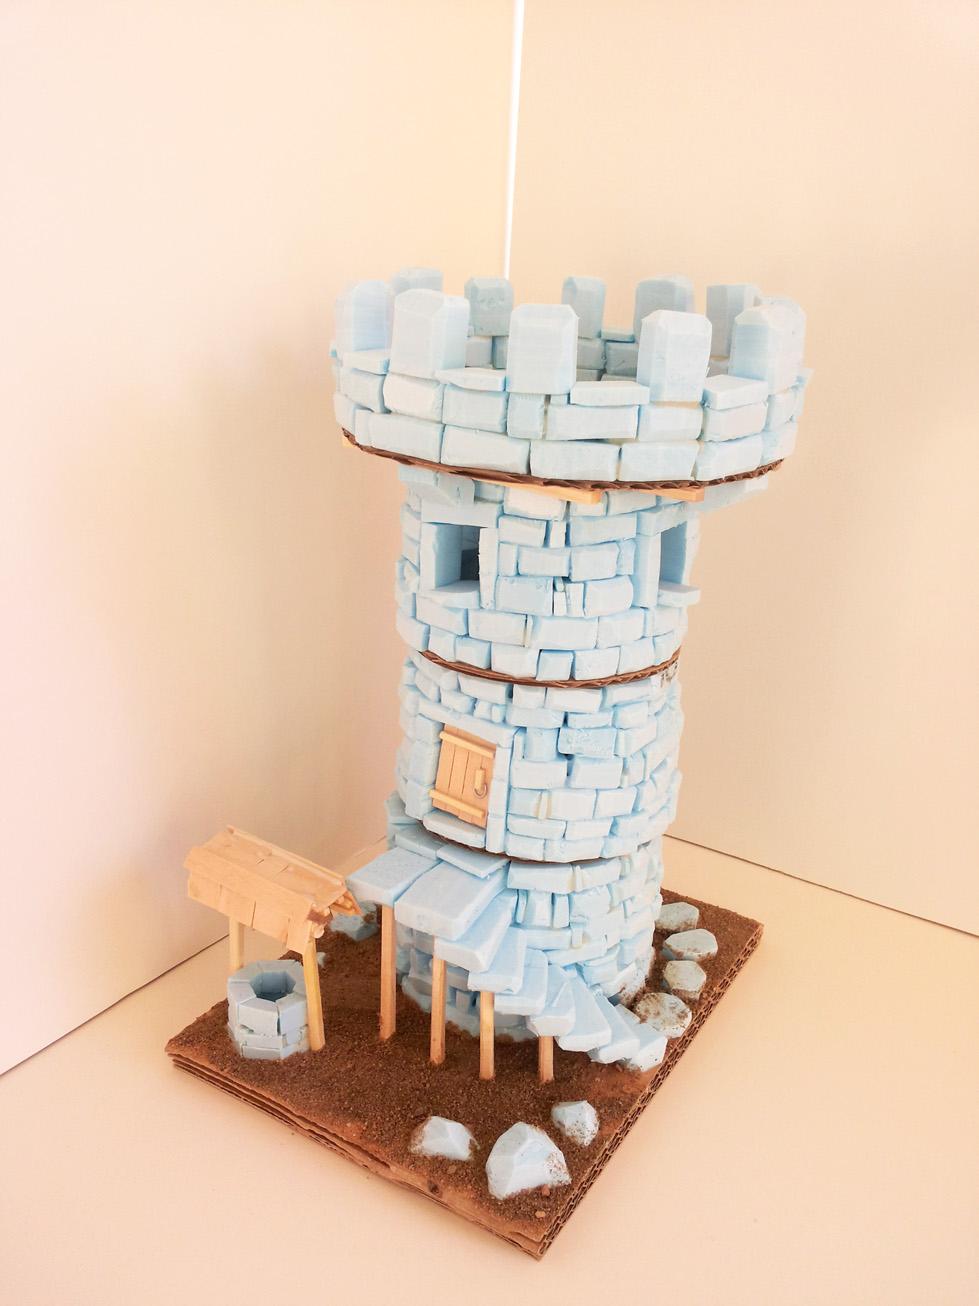 Hugg och slag : Tower of strength and Happy New Year